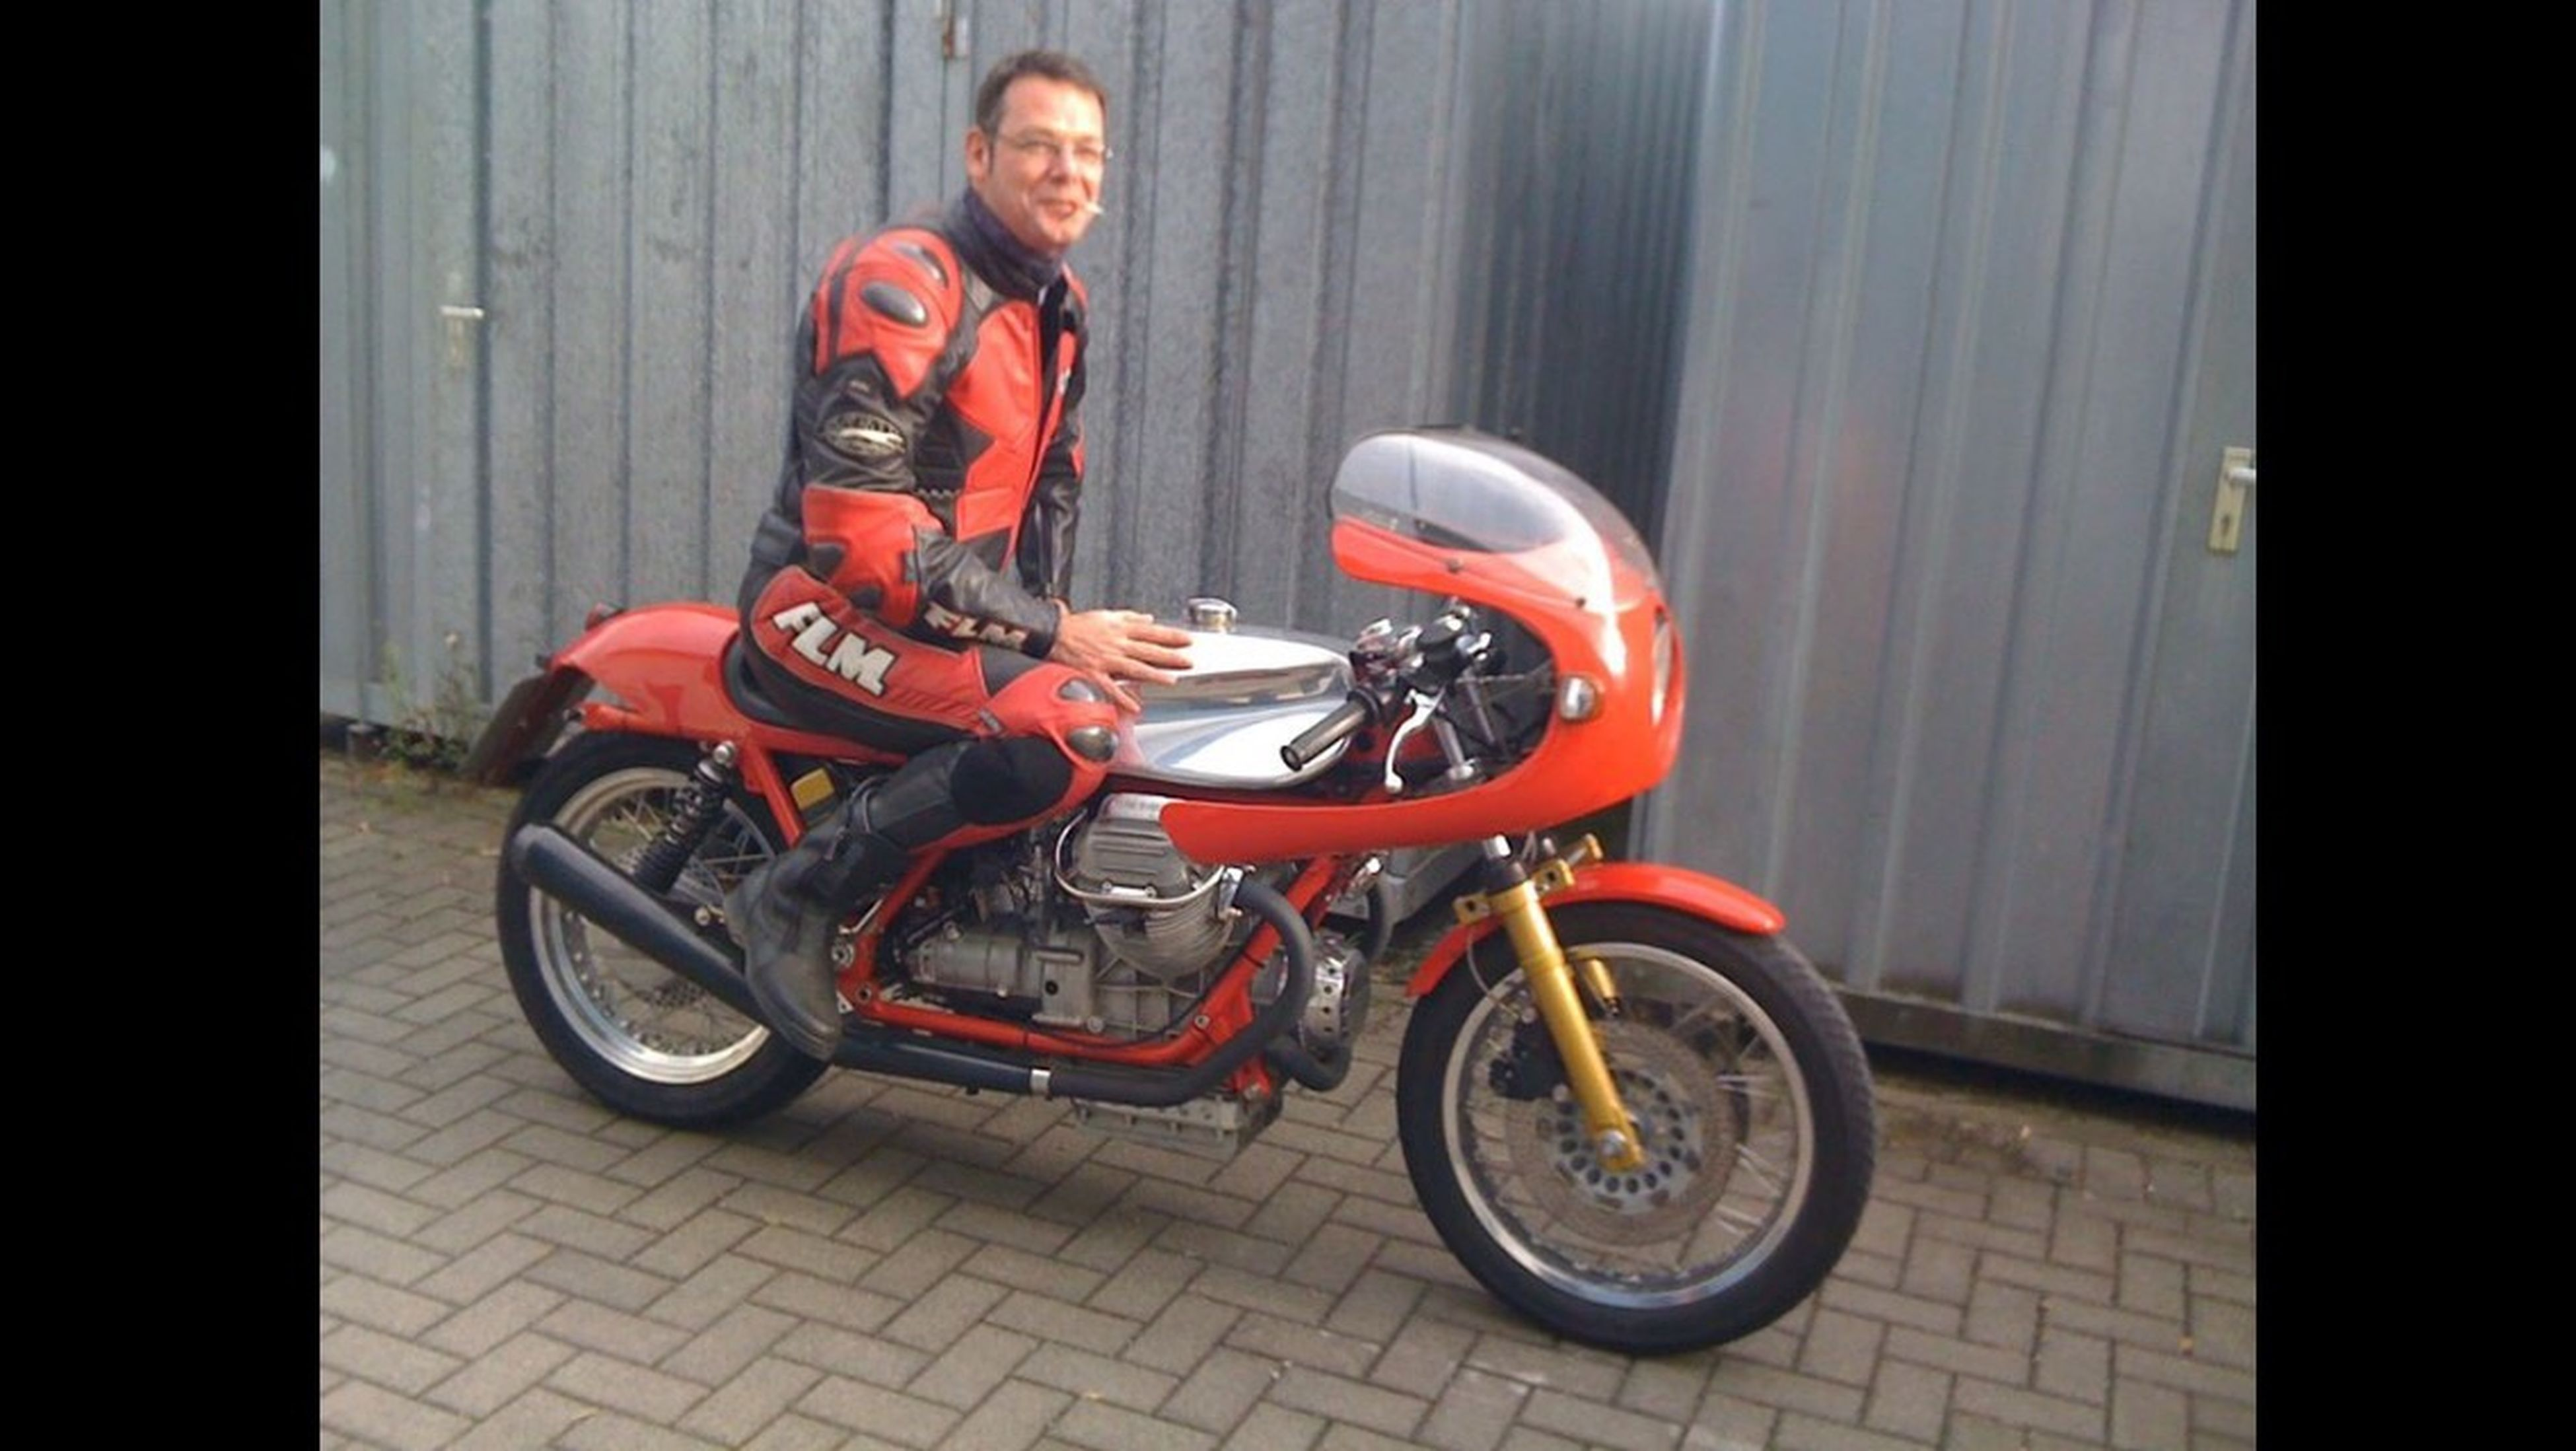 Motorcycles moto guzzi Le Mans